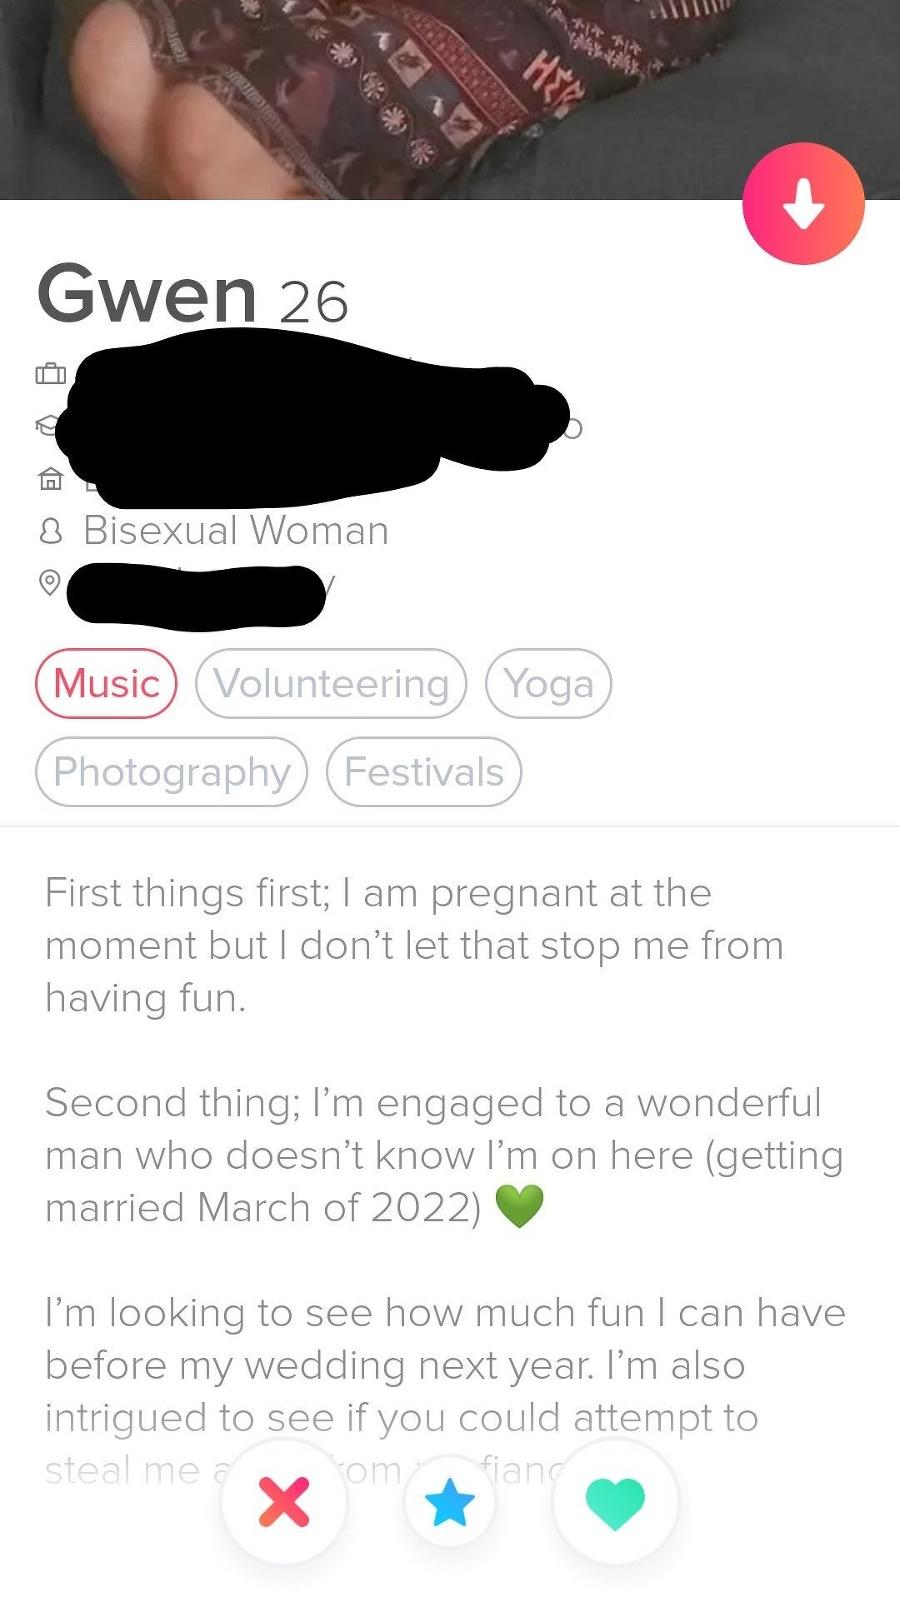 Tehotná budúca nevesta Gwen si založila konto na Tinderi.